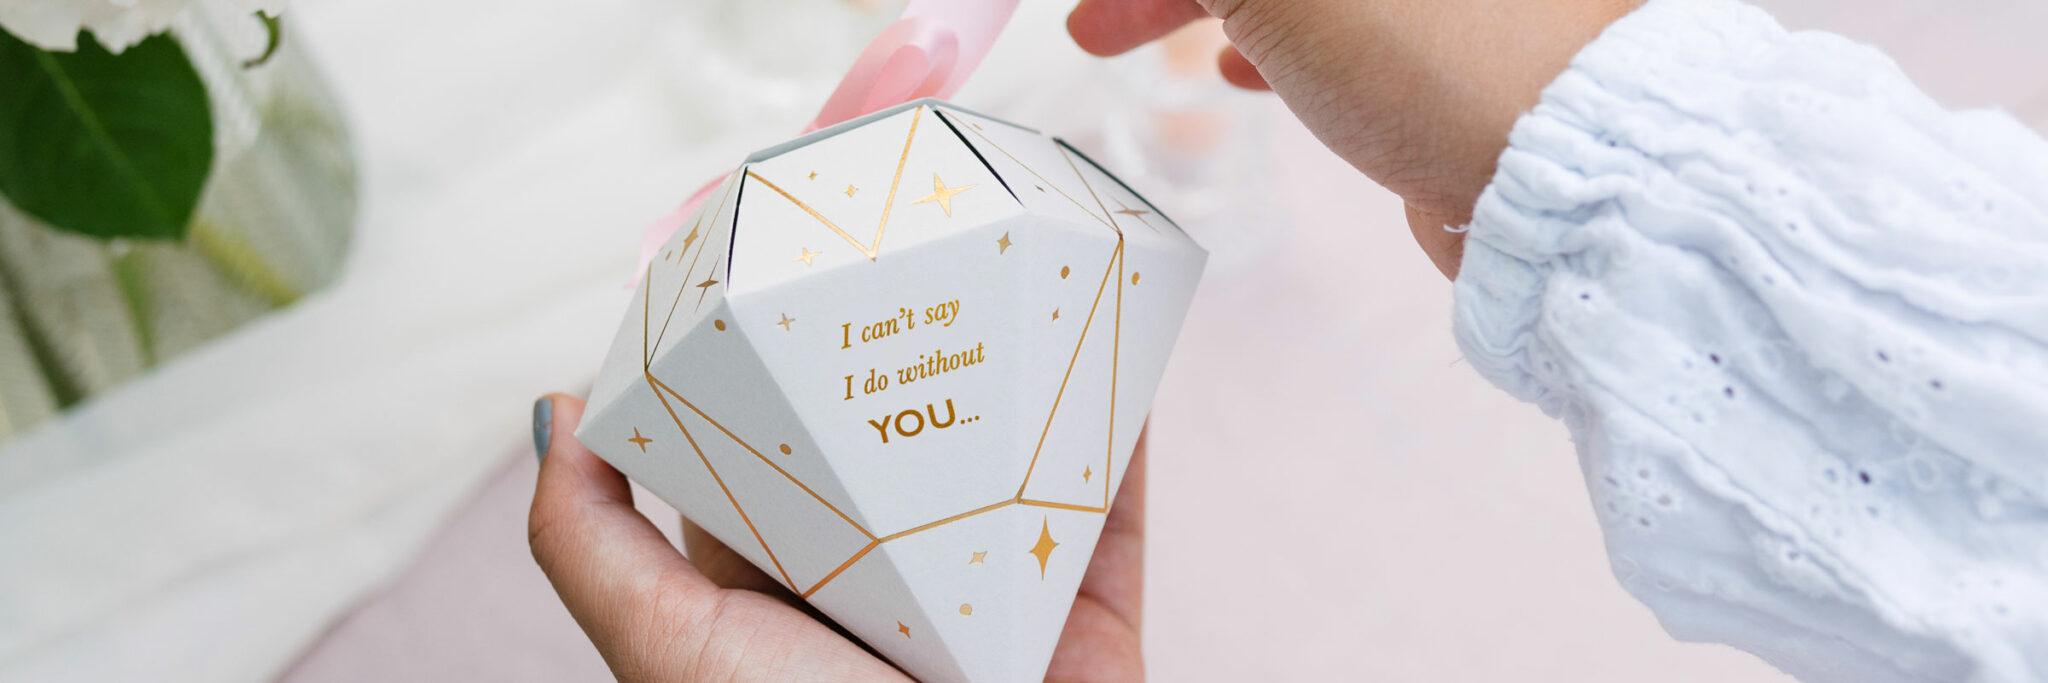 Martha brook weddings be my bridesmaid proposal gifts